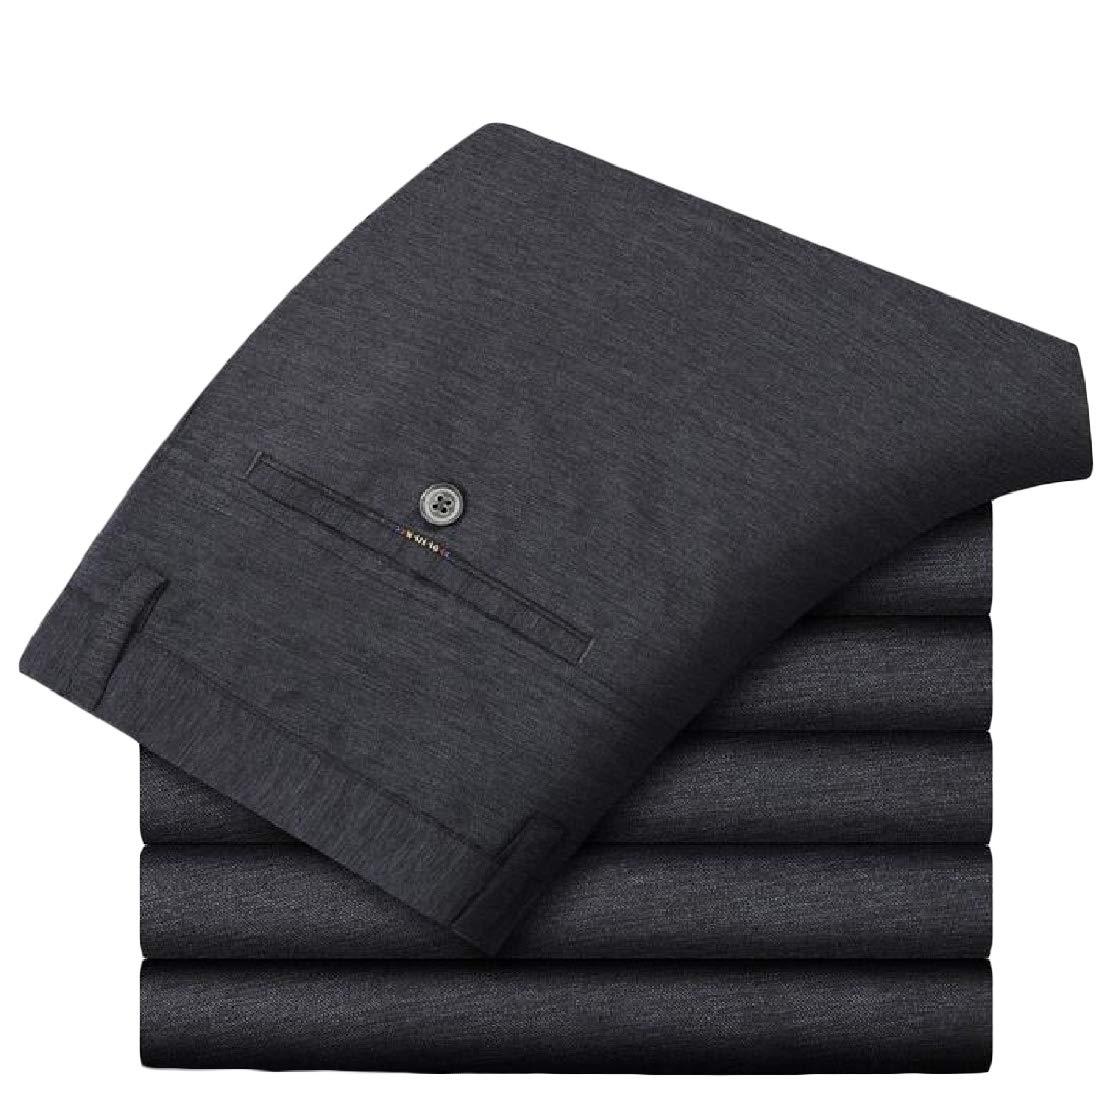 Joe Wenko Mens Casual Business Wrinkle Free Trousers High Waisted Long Pants